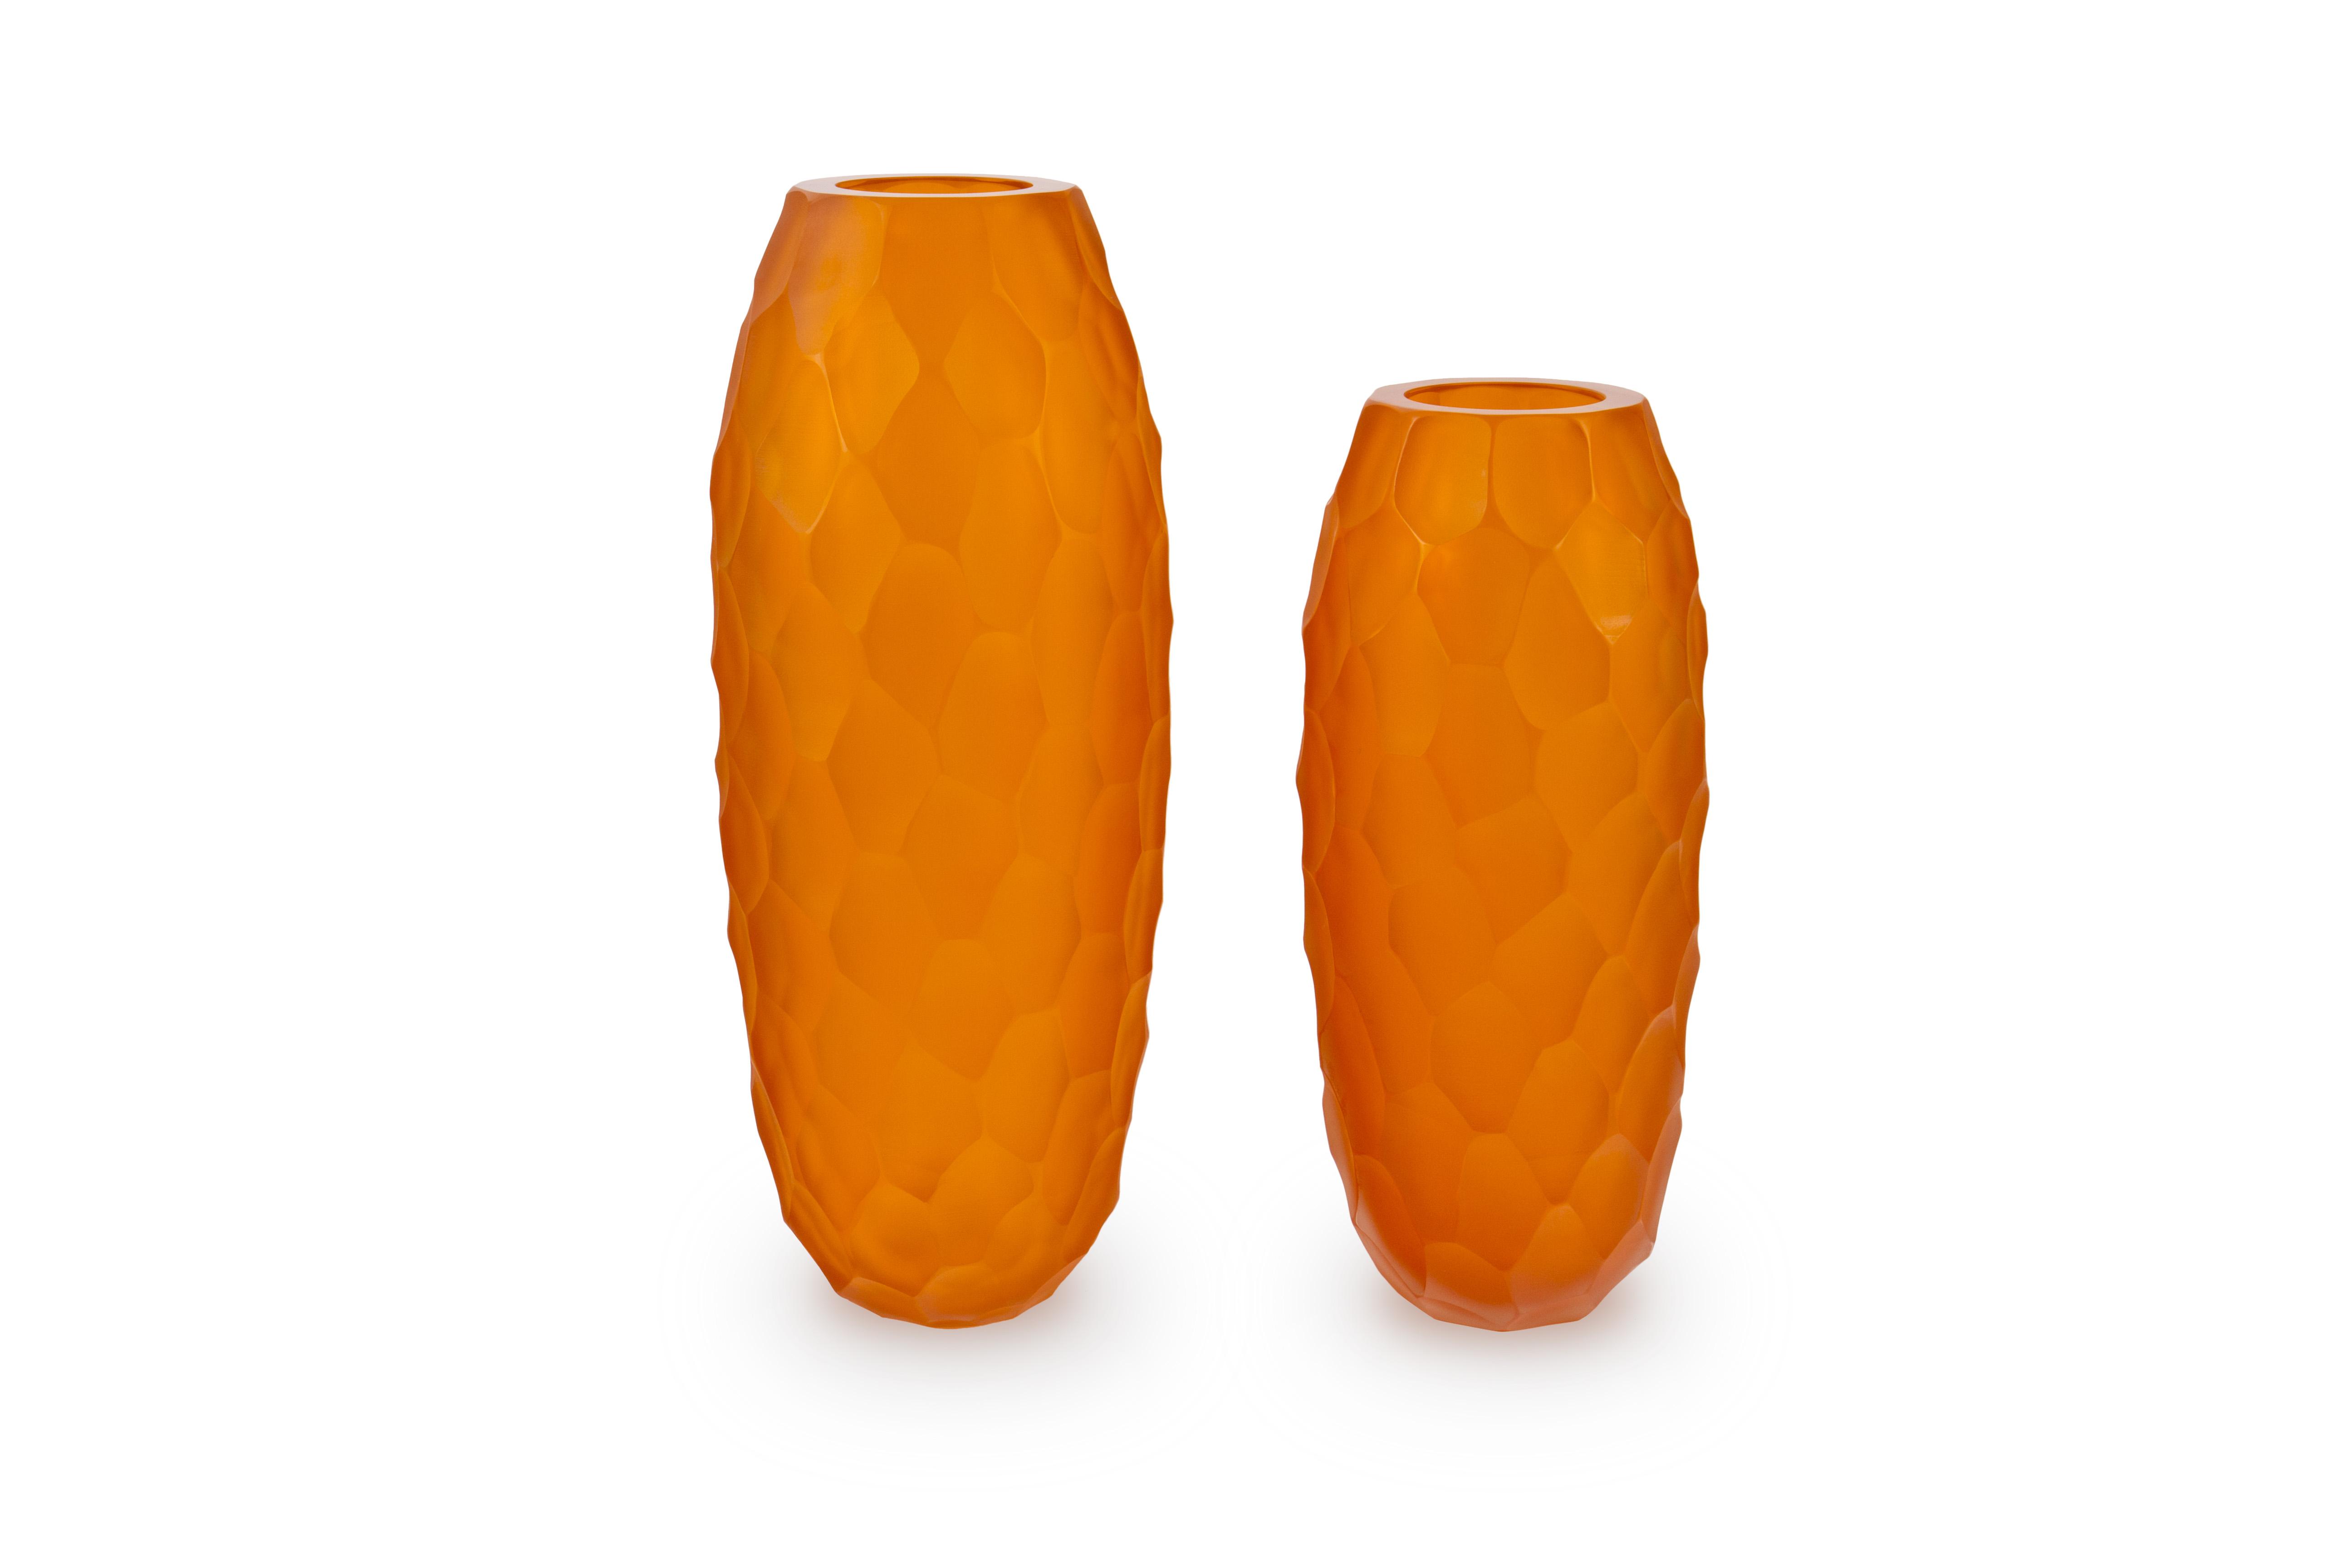 Battuti Vases